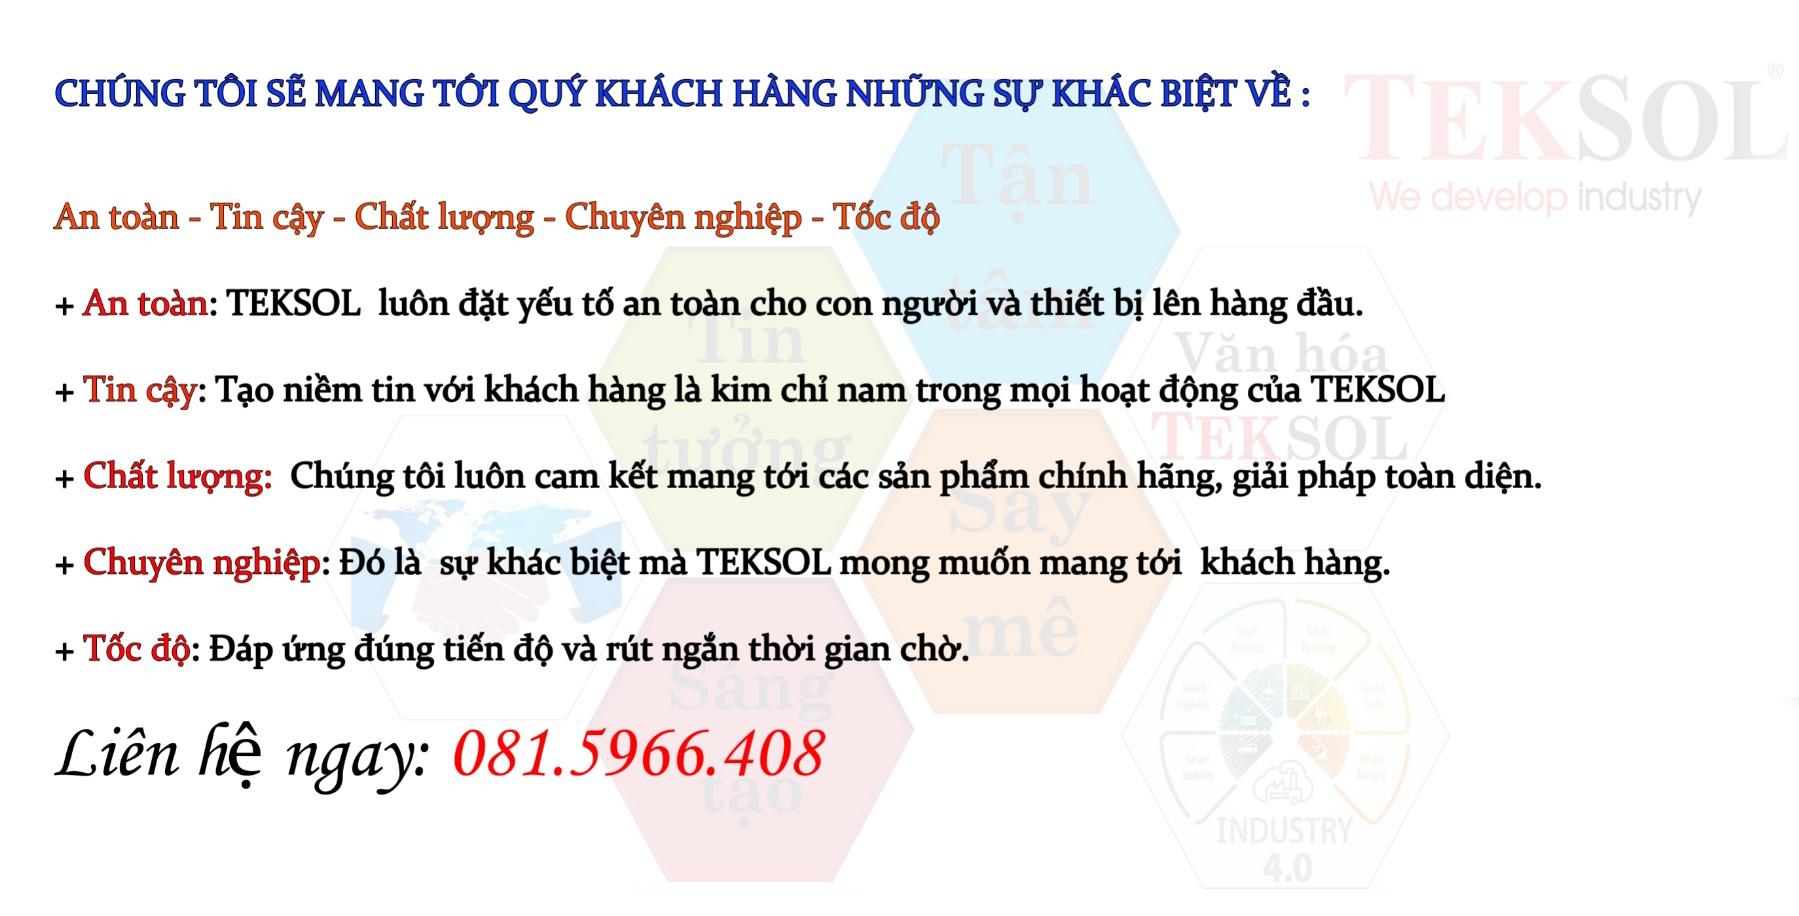 https://auto.vnteksol.com/uploads/news/upanh/an-toan-tin-cay-chat-luong.jpg